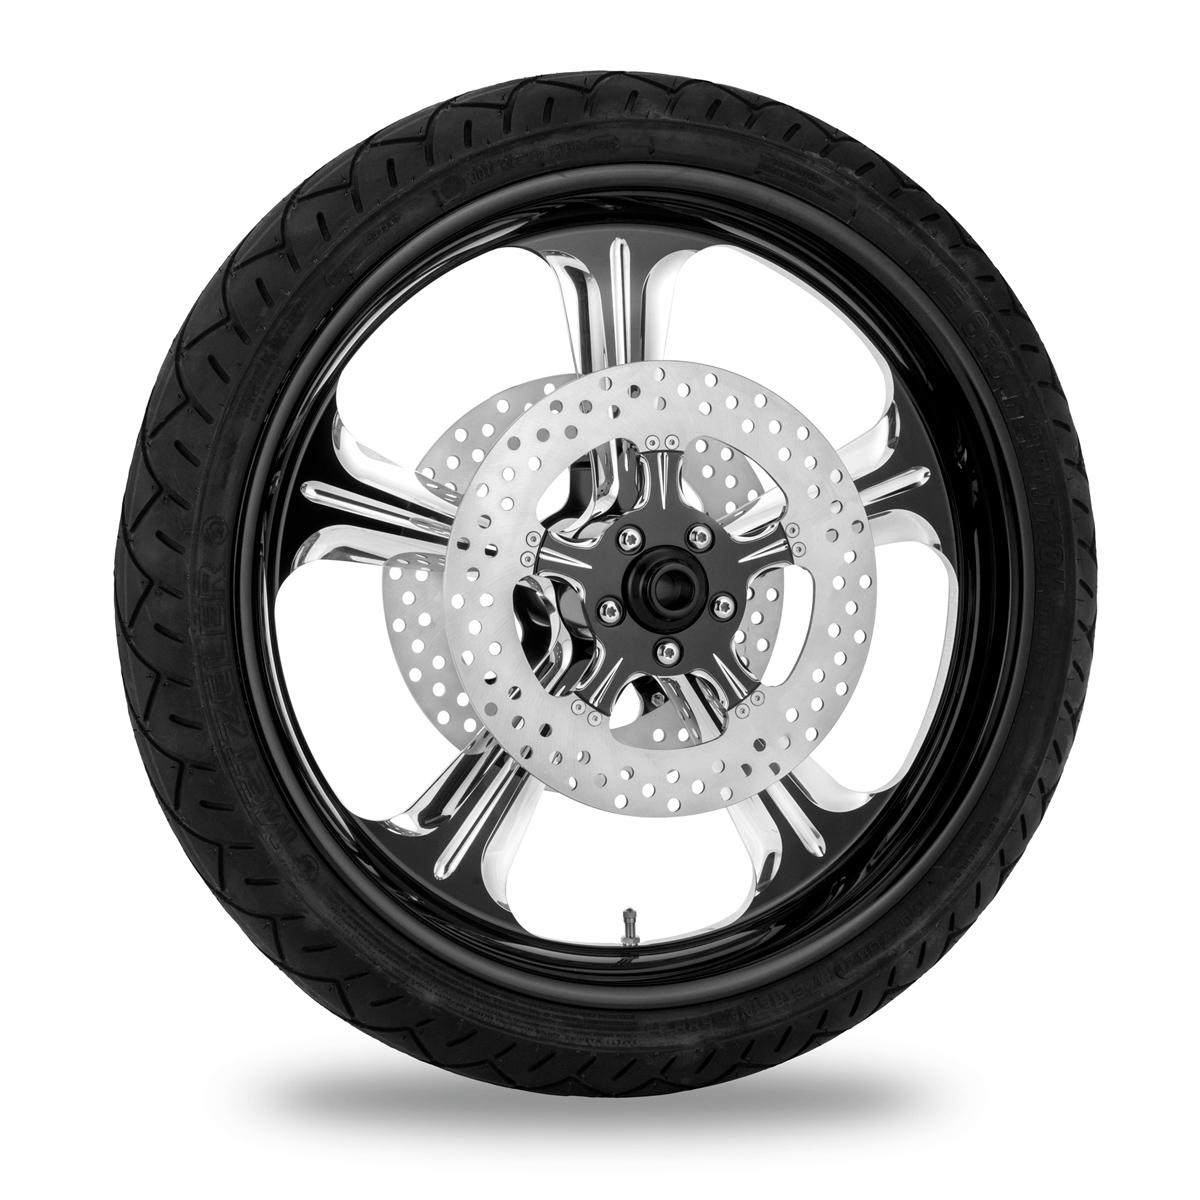 Performance Machine Wrath Platinum Cut Front Wheel Package 21x3.5 Non-ABS